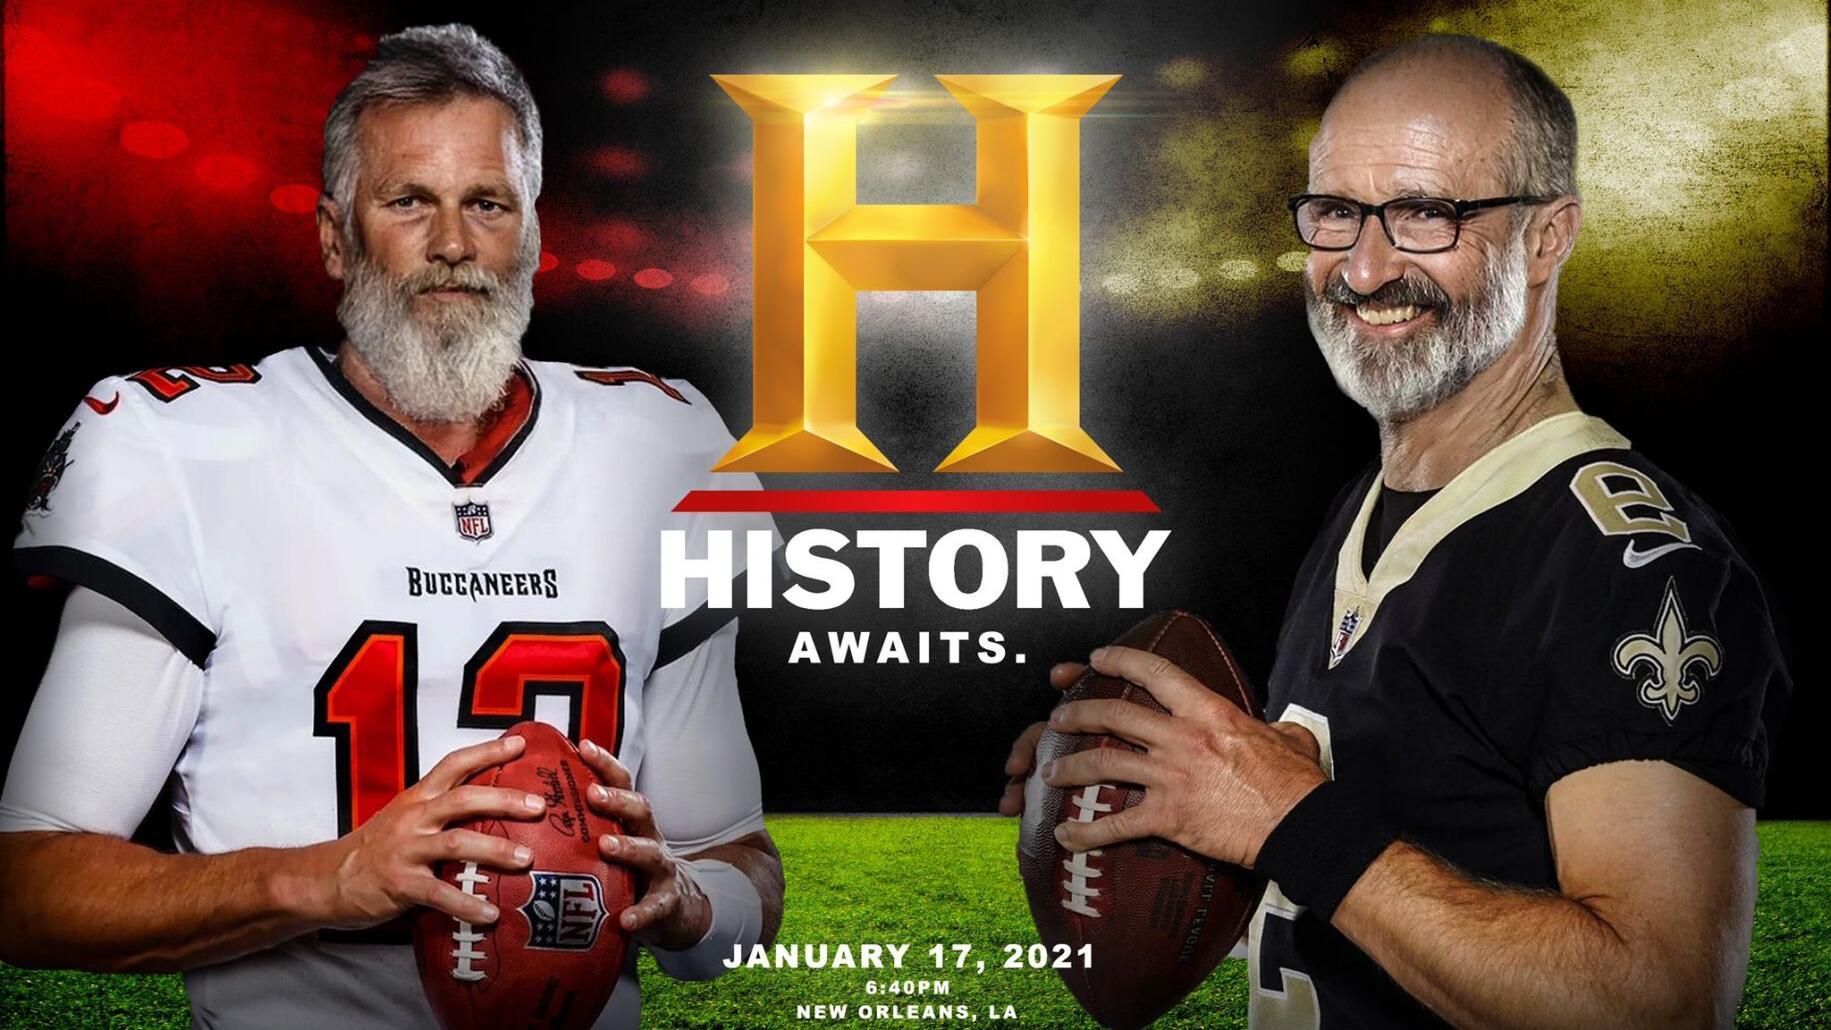 Saints on Tom Brady's 'History' meme: Drew Brees wants more hair, Cam  Jordan thought it was real   Saints   nola.com